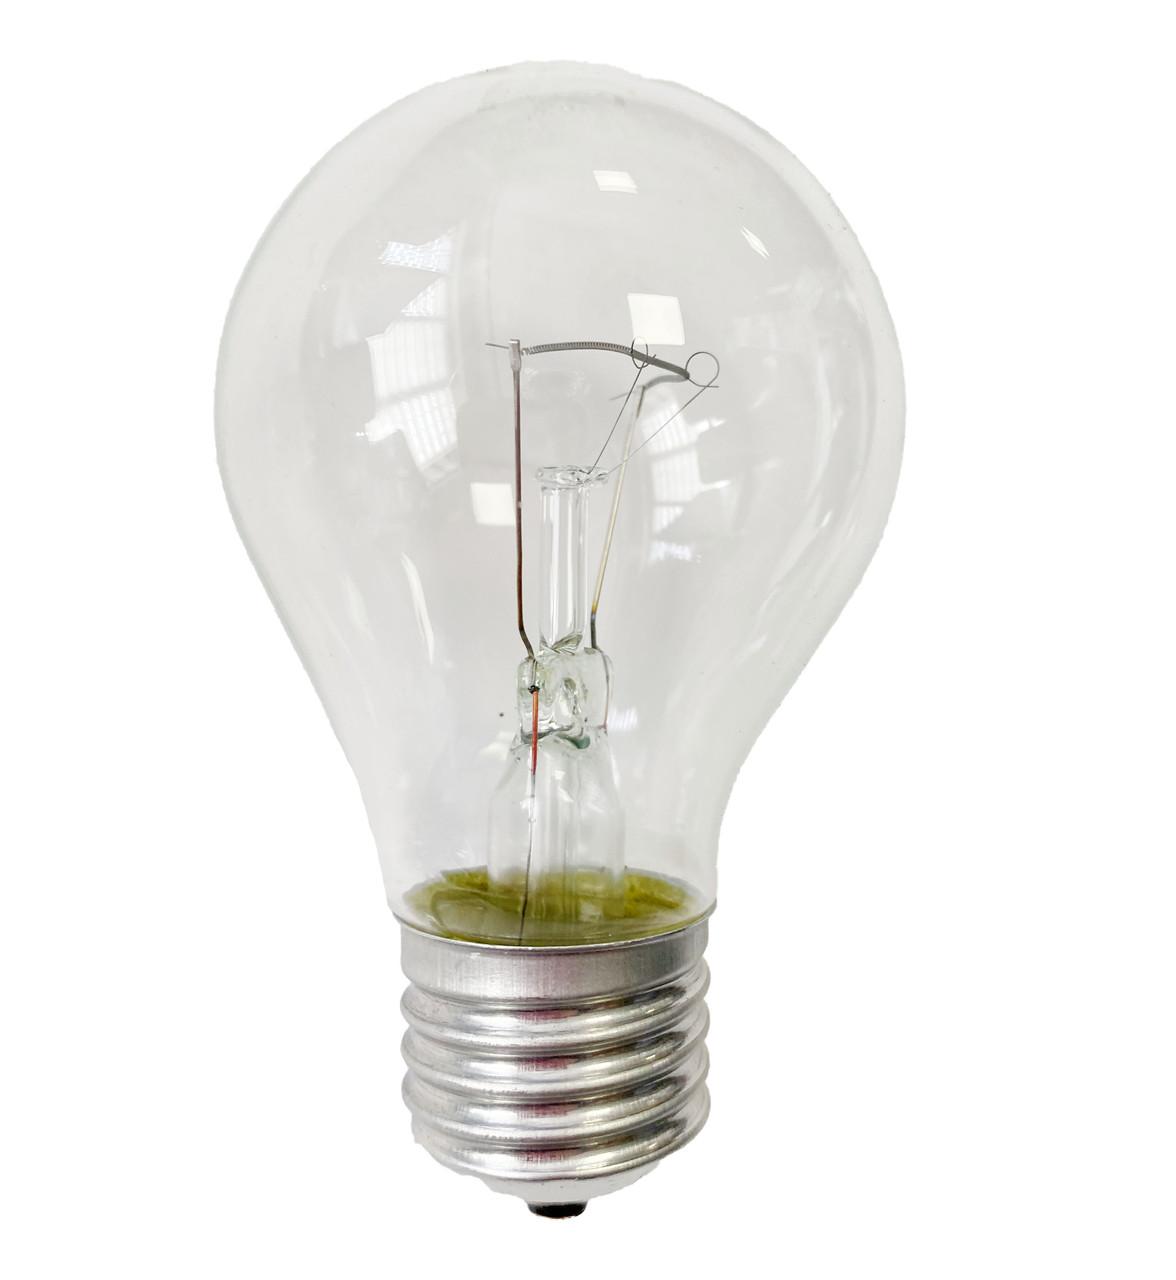 Низковольтная электролампа МО 24 В 60Вт, цоколь Е27